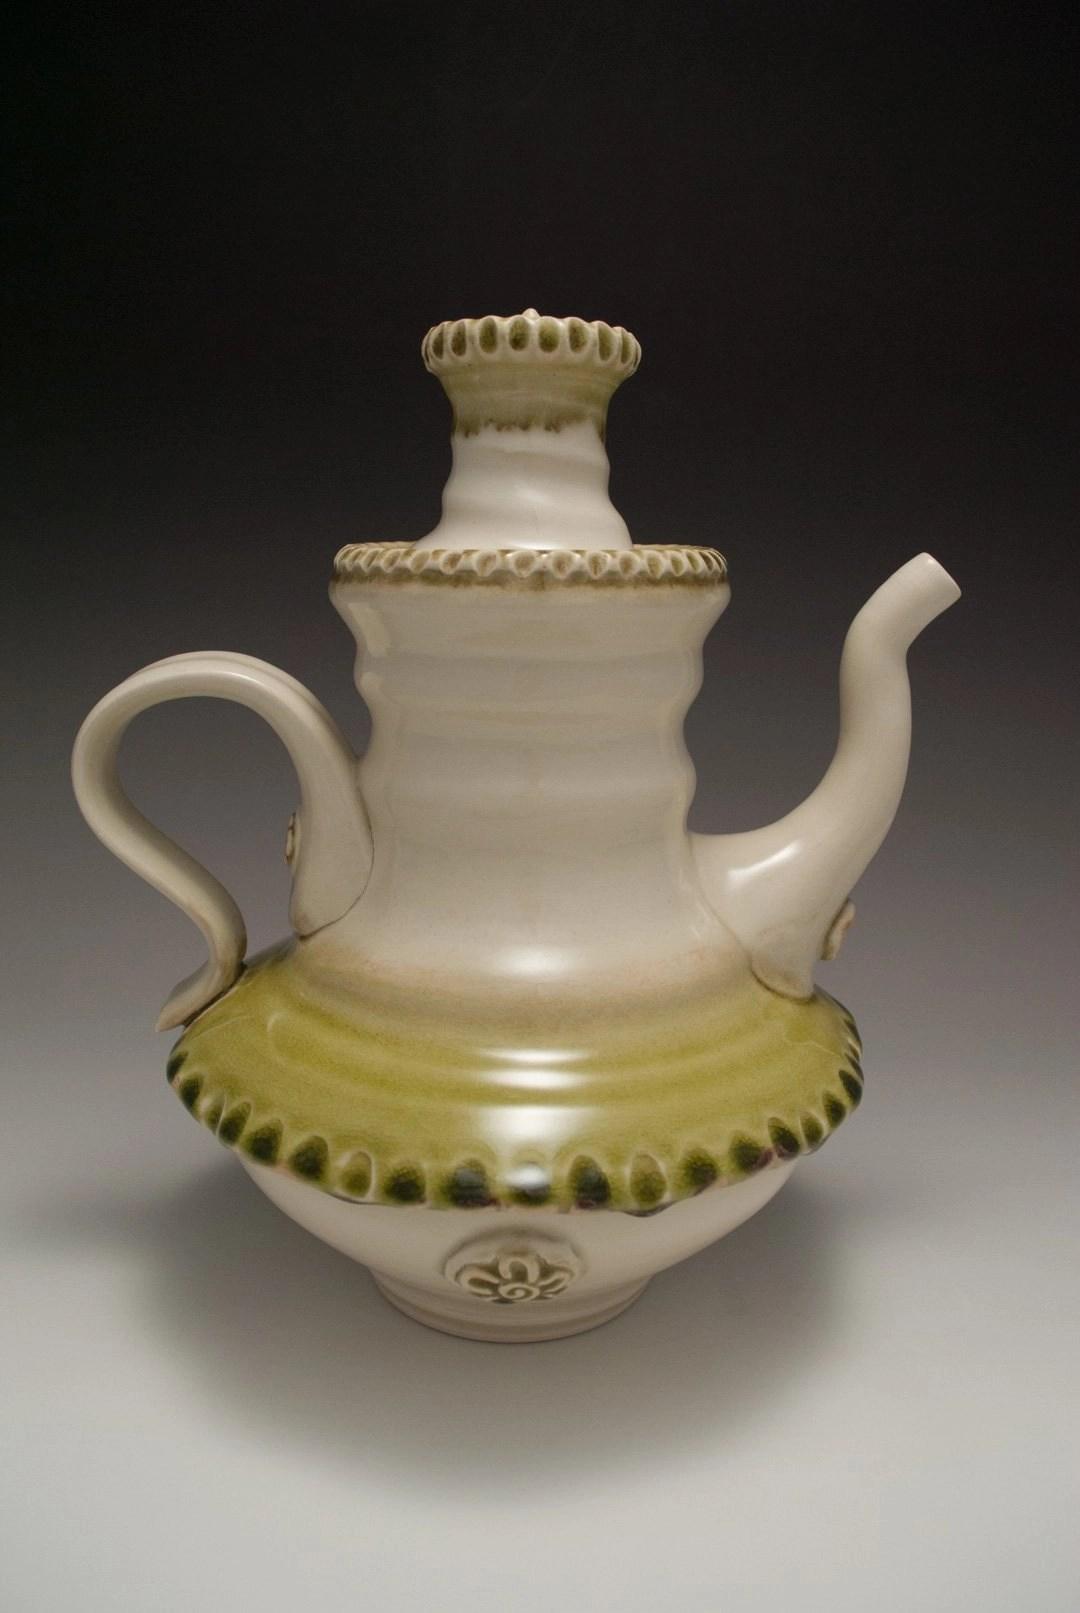 unique teapot green and white